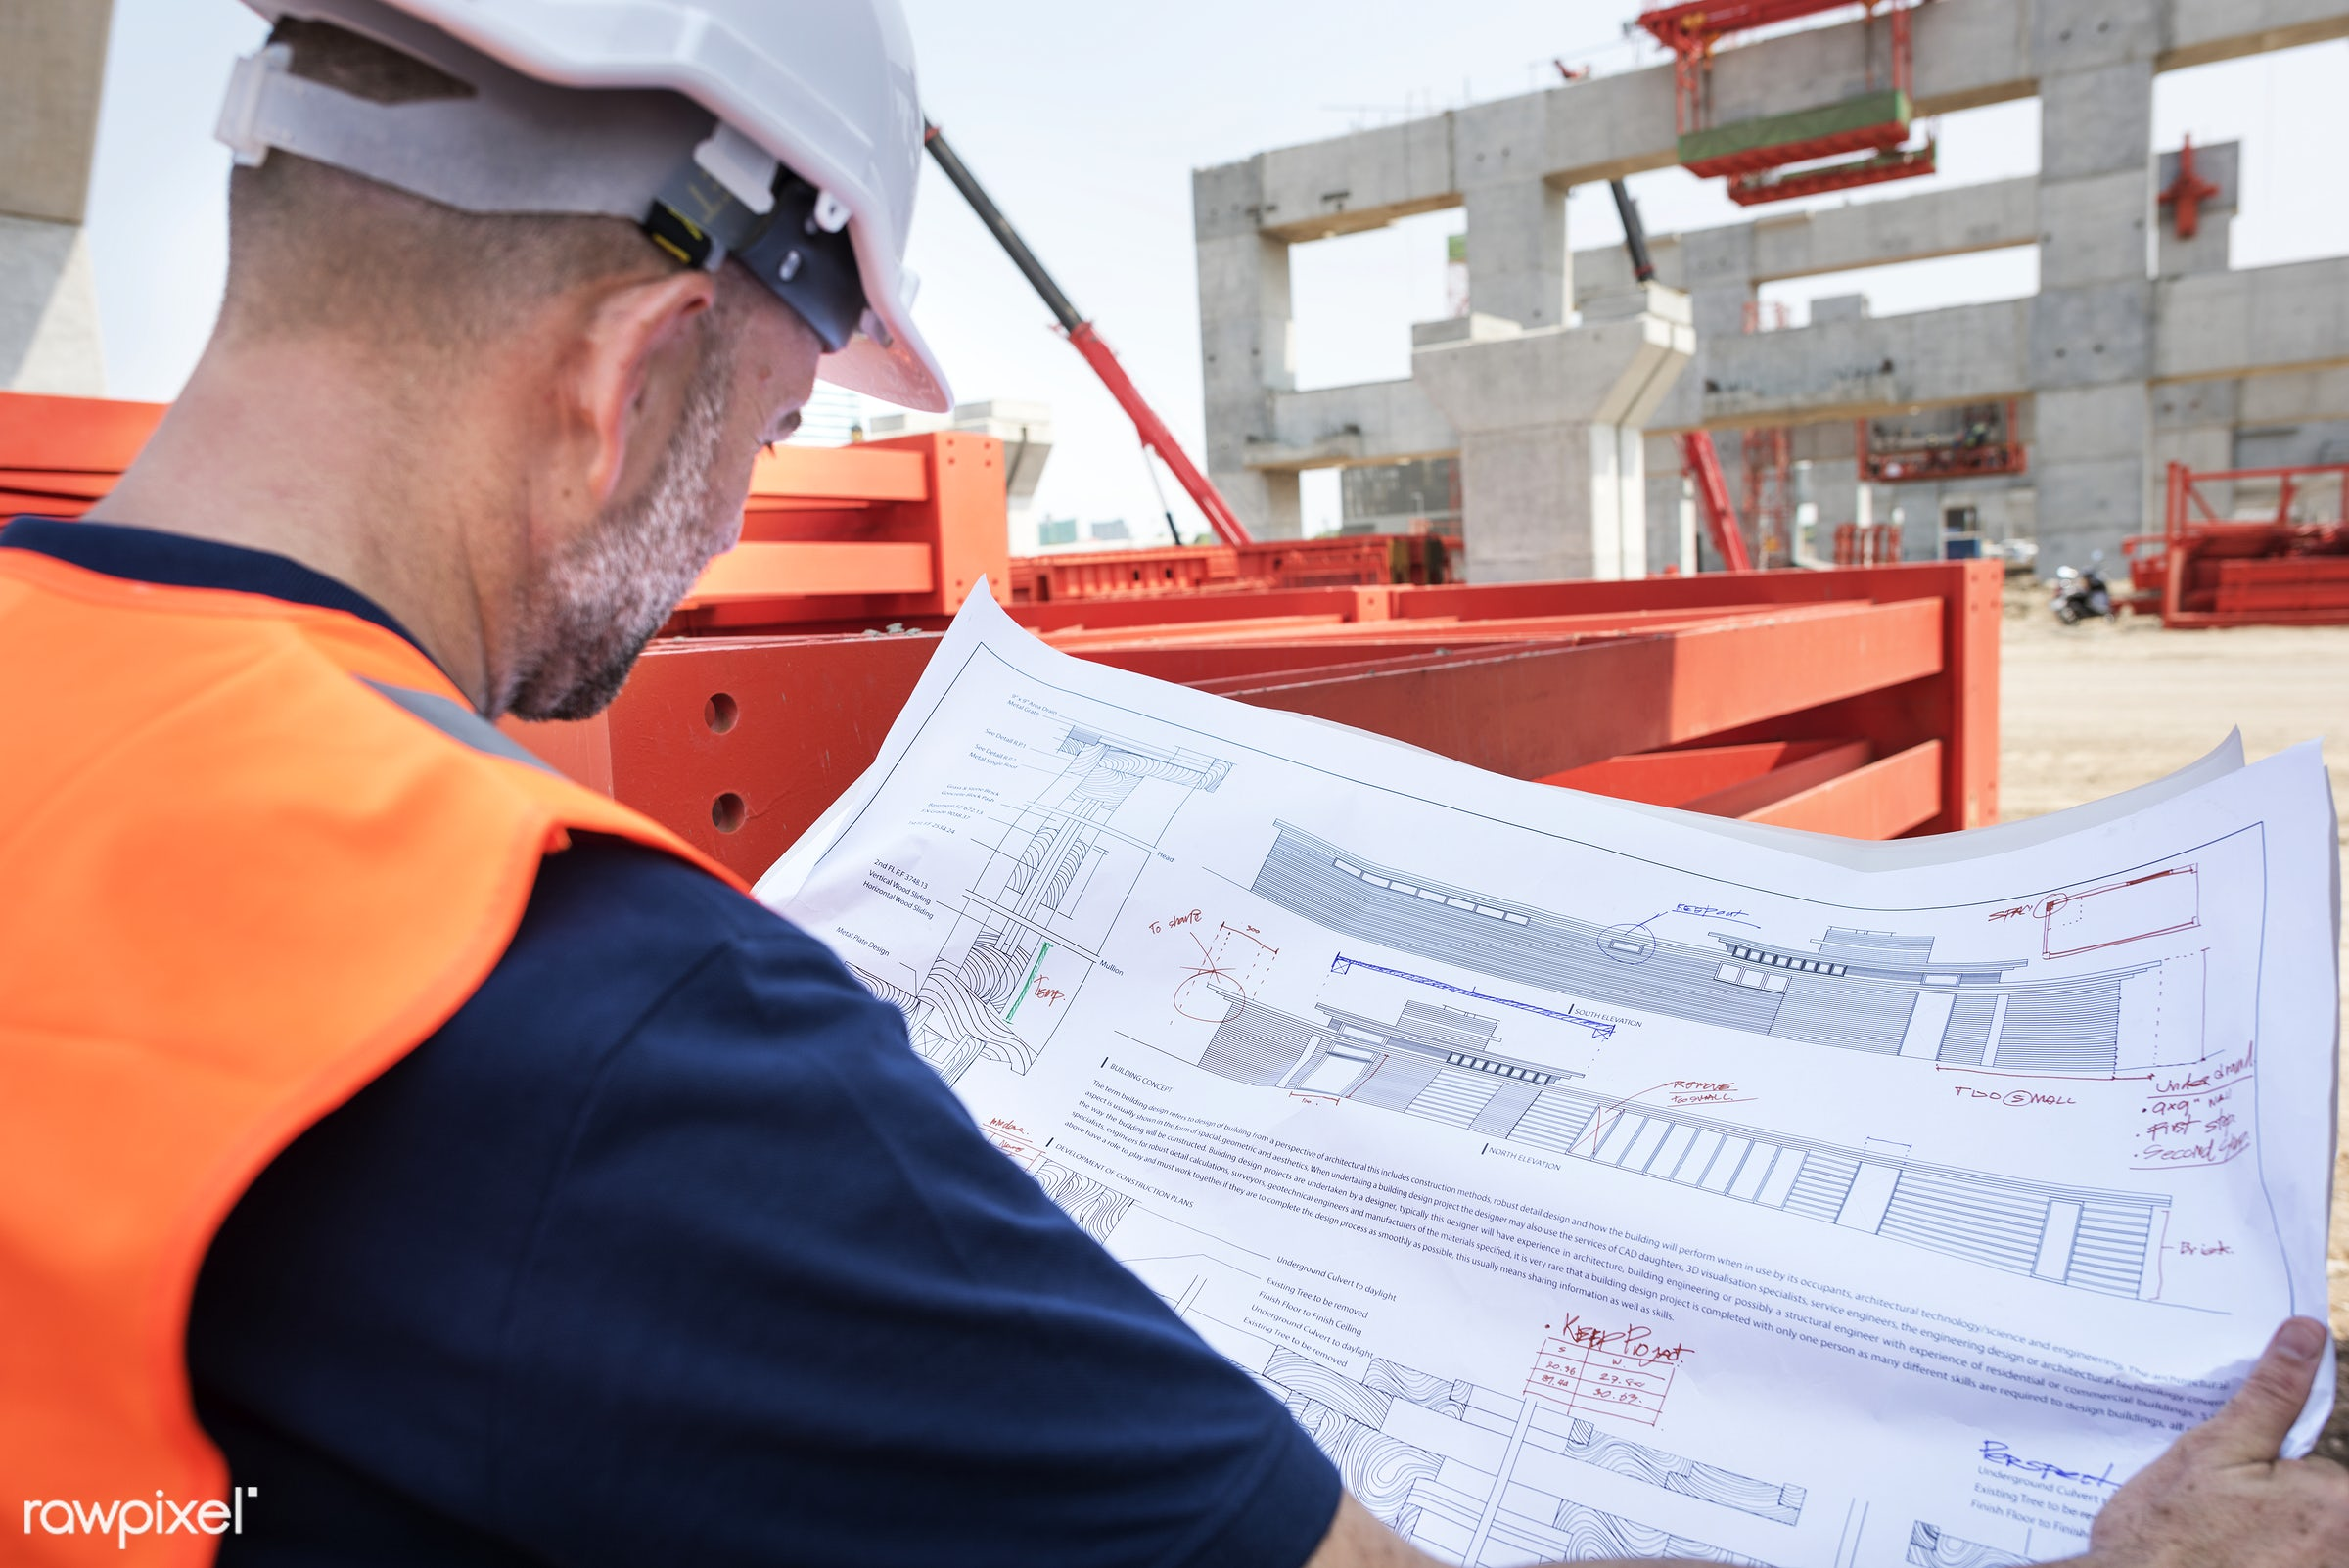 Site engineer on a construction site - architecture, blueprint, building, built, career, check, construction, construction...